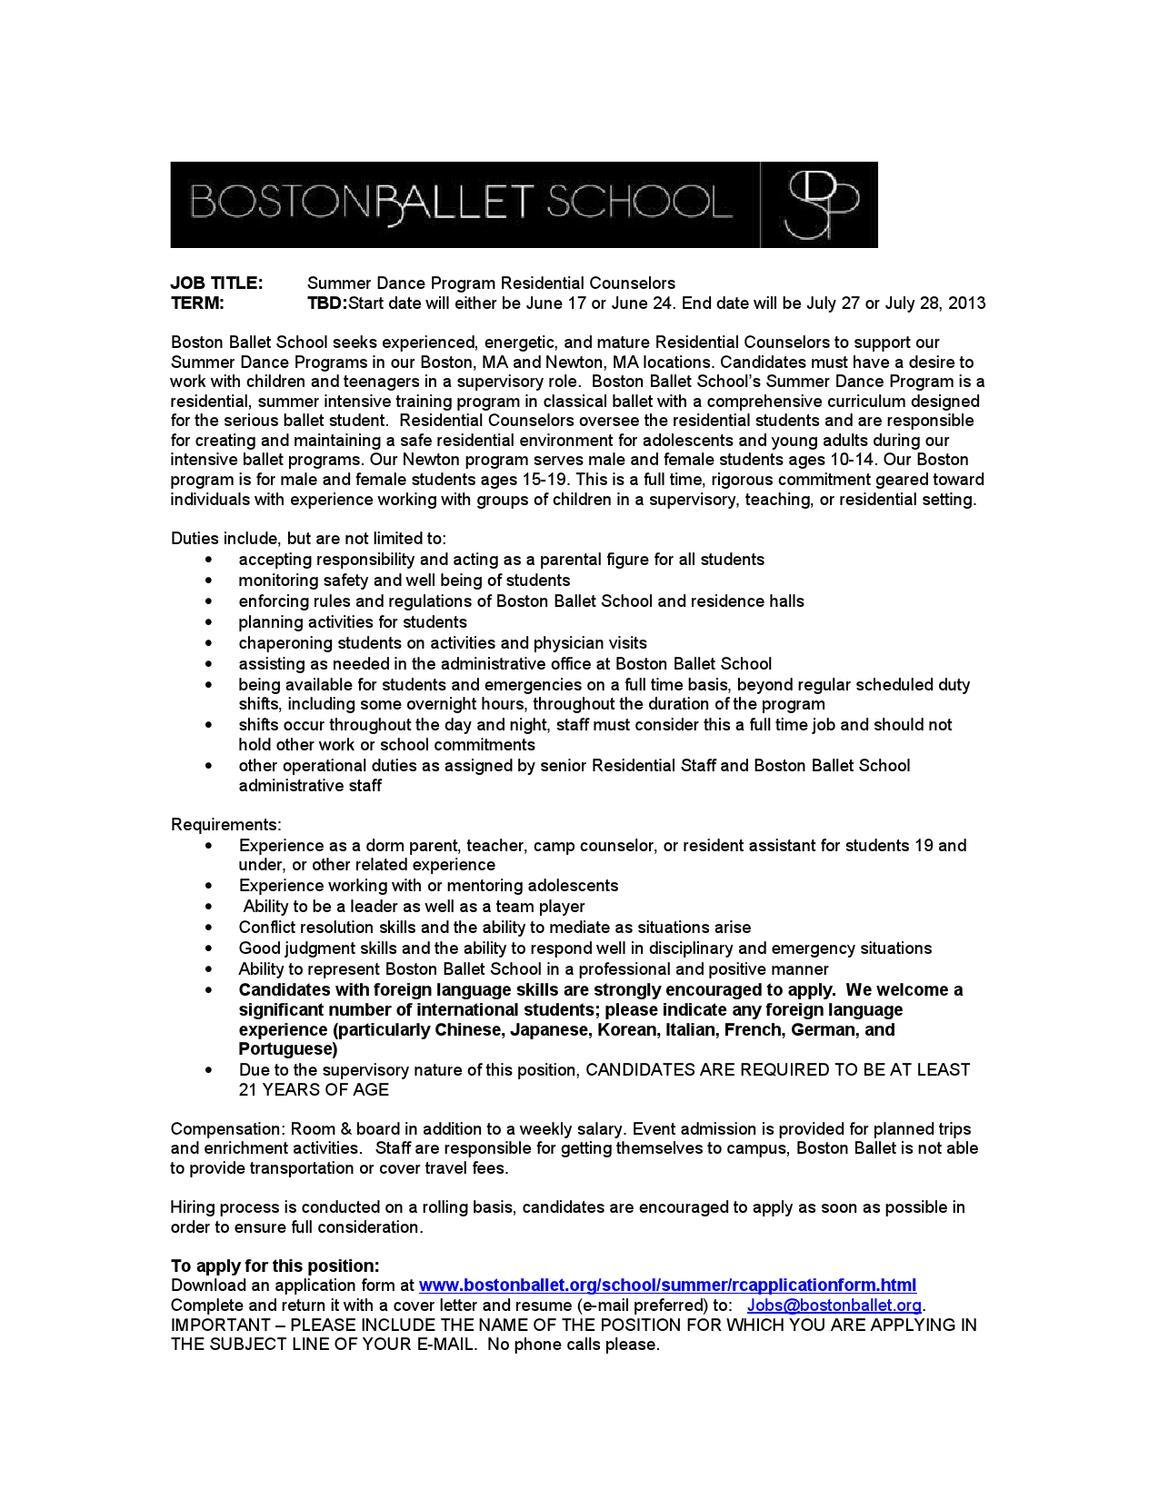 Summer 2013 Residential Counselors for Boston Ballet School ...